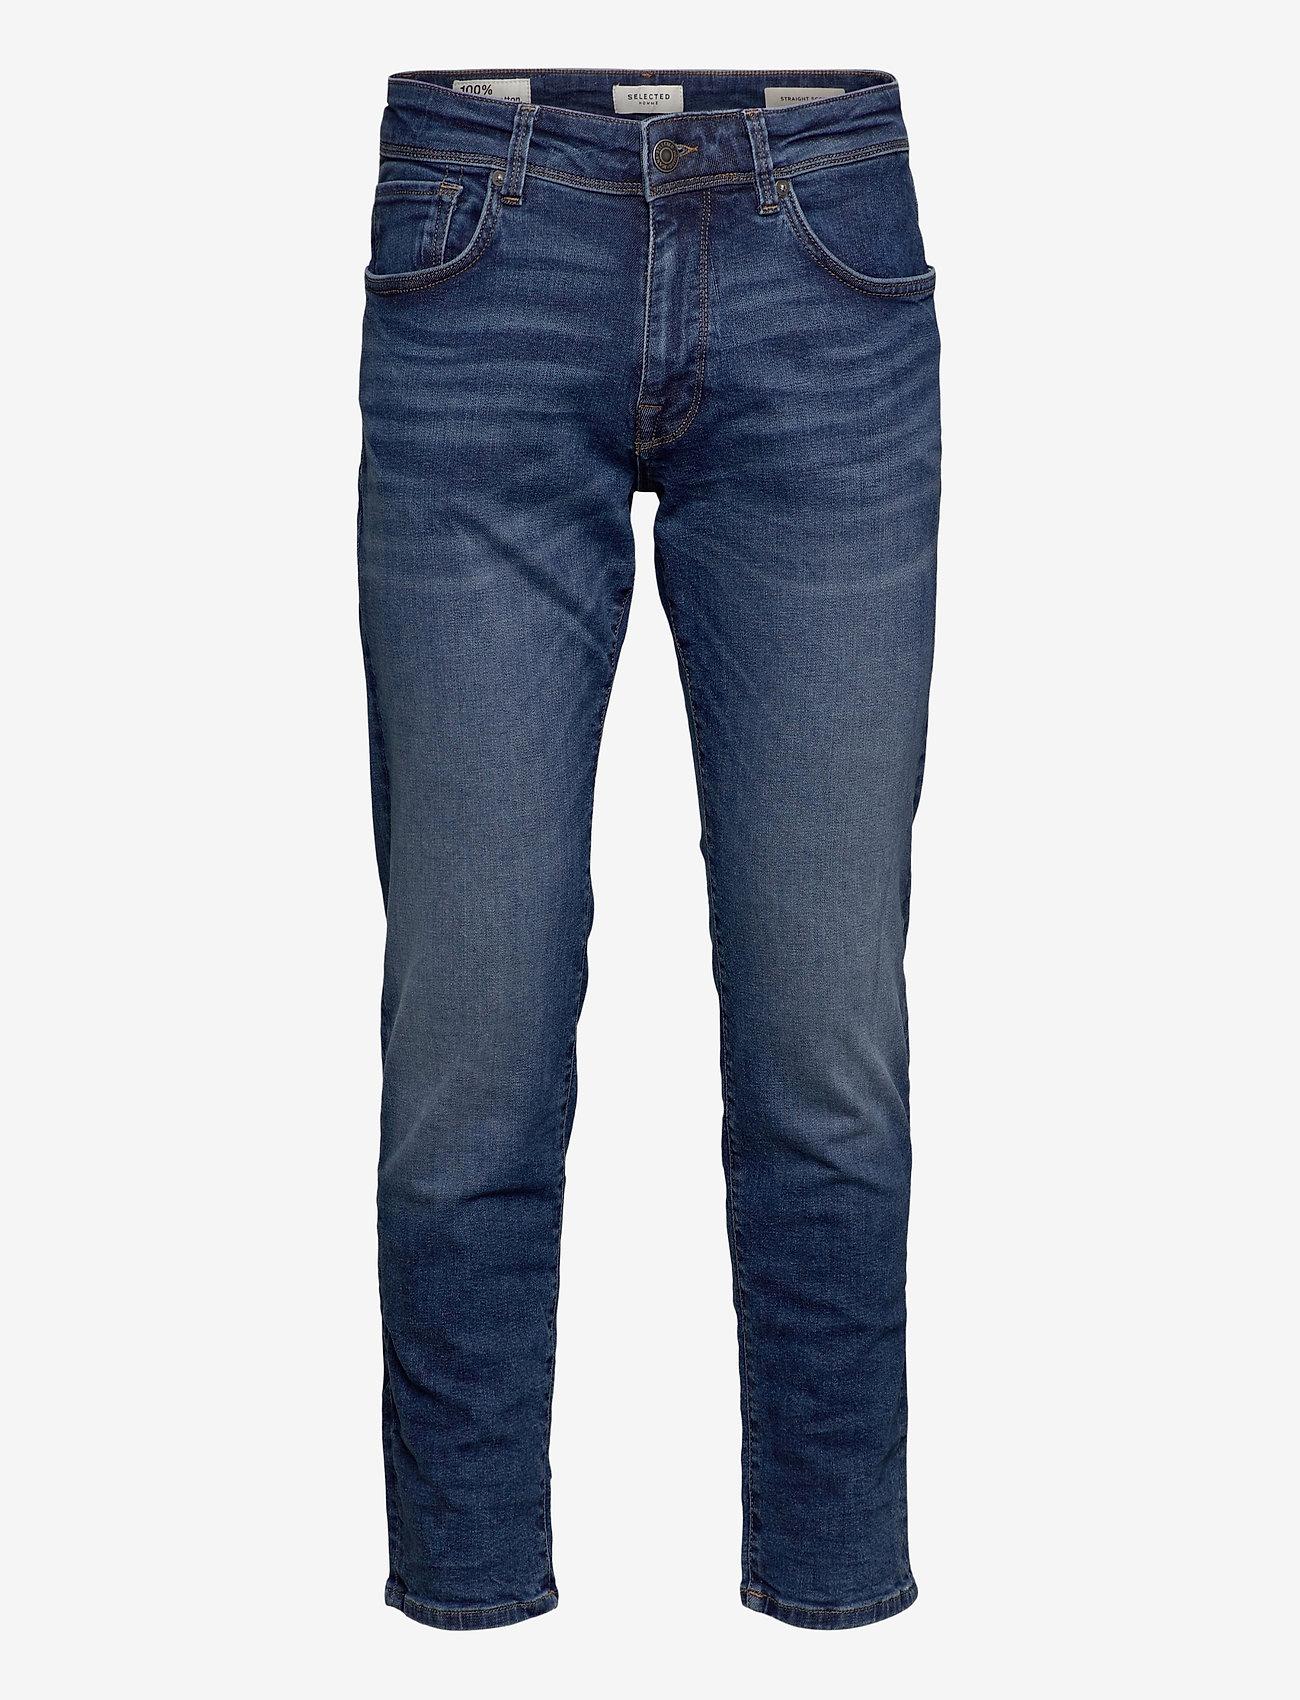 Selected Homme - SLHSTRAIGHT-SCOTT 6212 MB SU-ST JNS - regular jeans - medium blue denim - 0